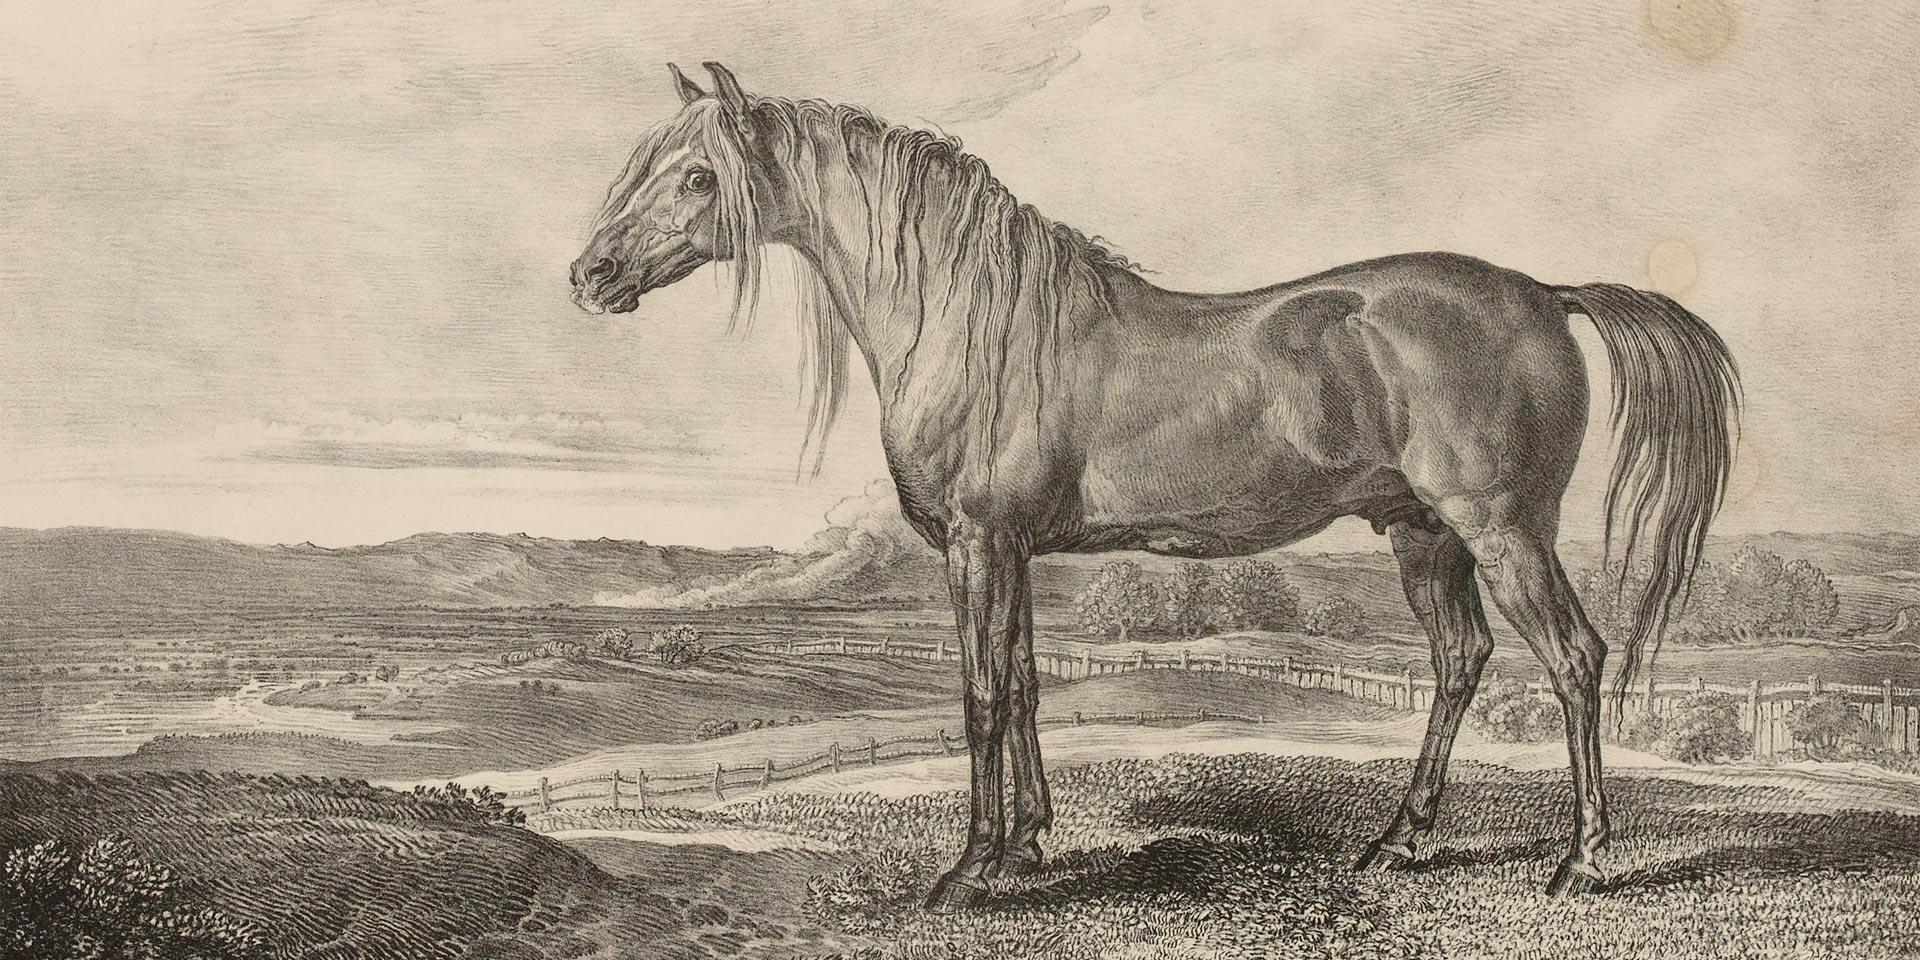 Copenhagen, the horse rode by the Duke of Wellington, 1824